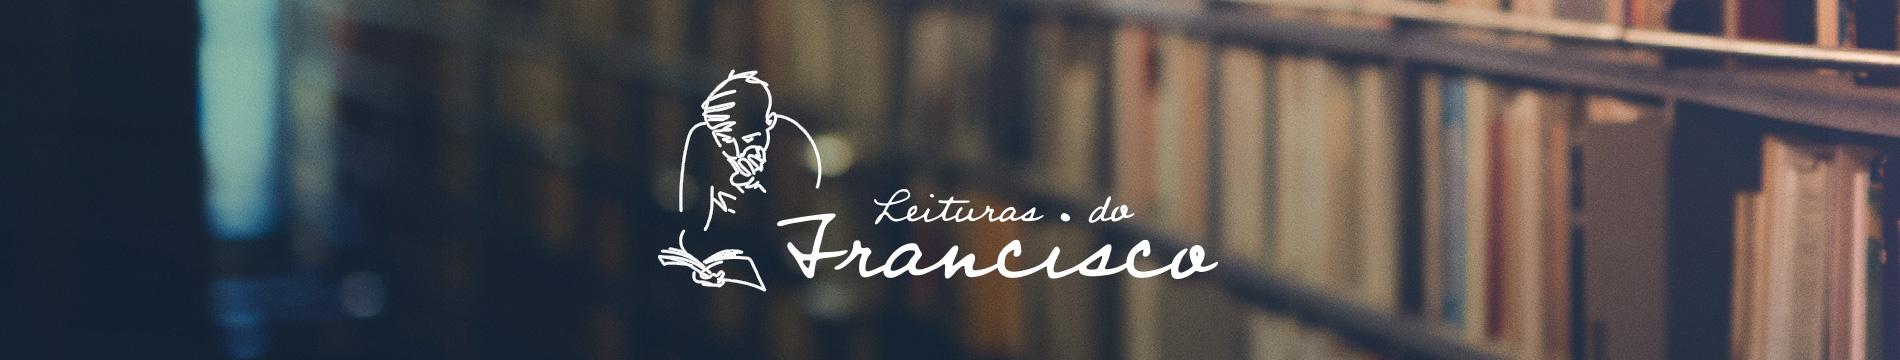 rafc-leituras-francisco-1900x360